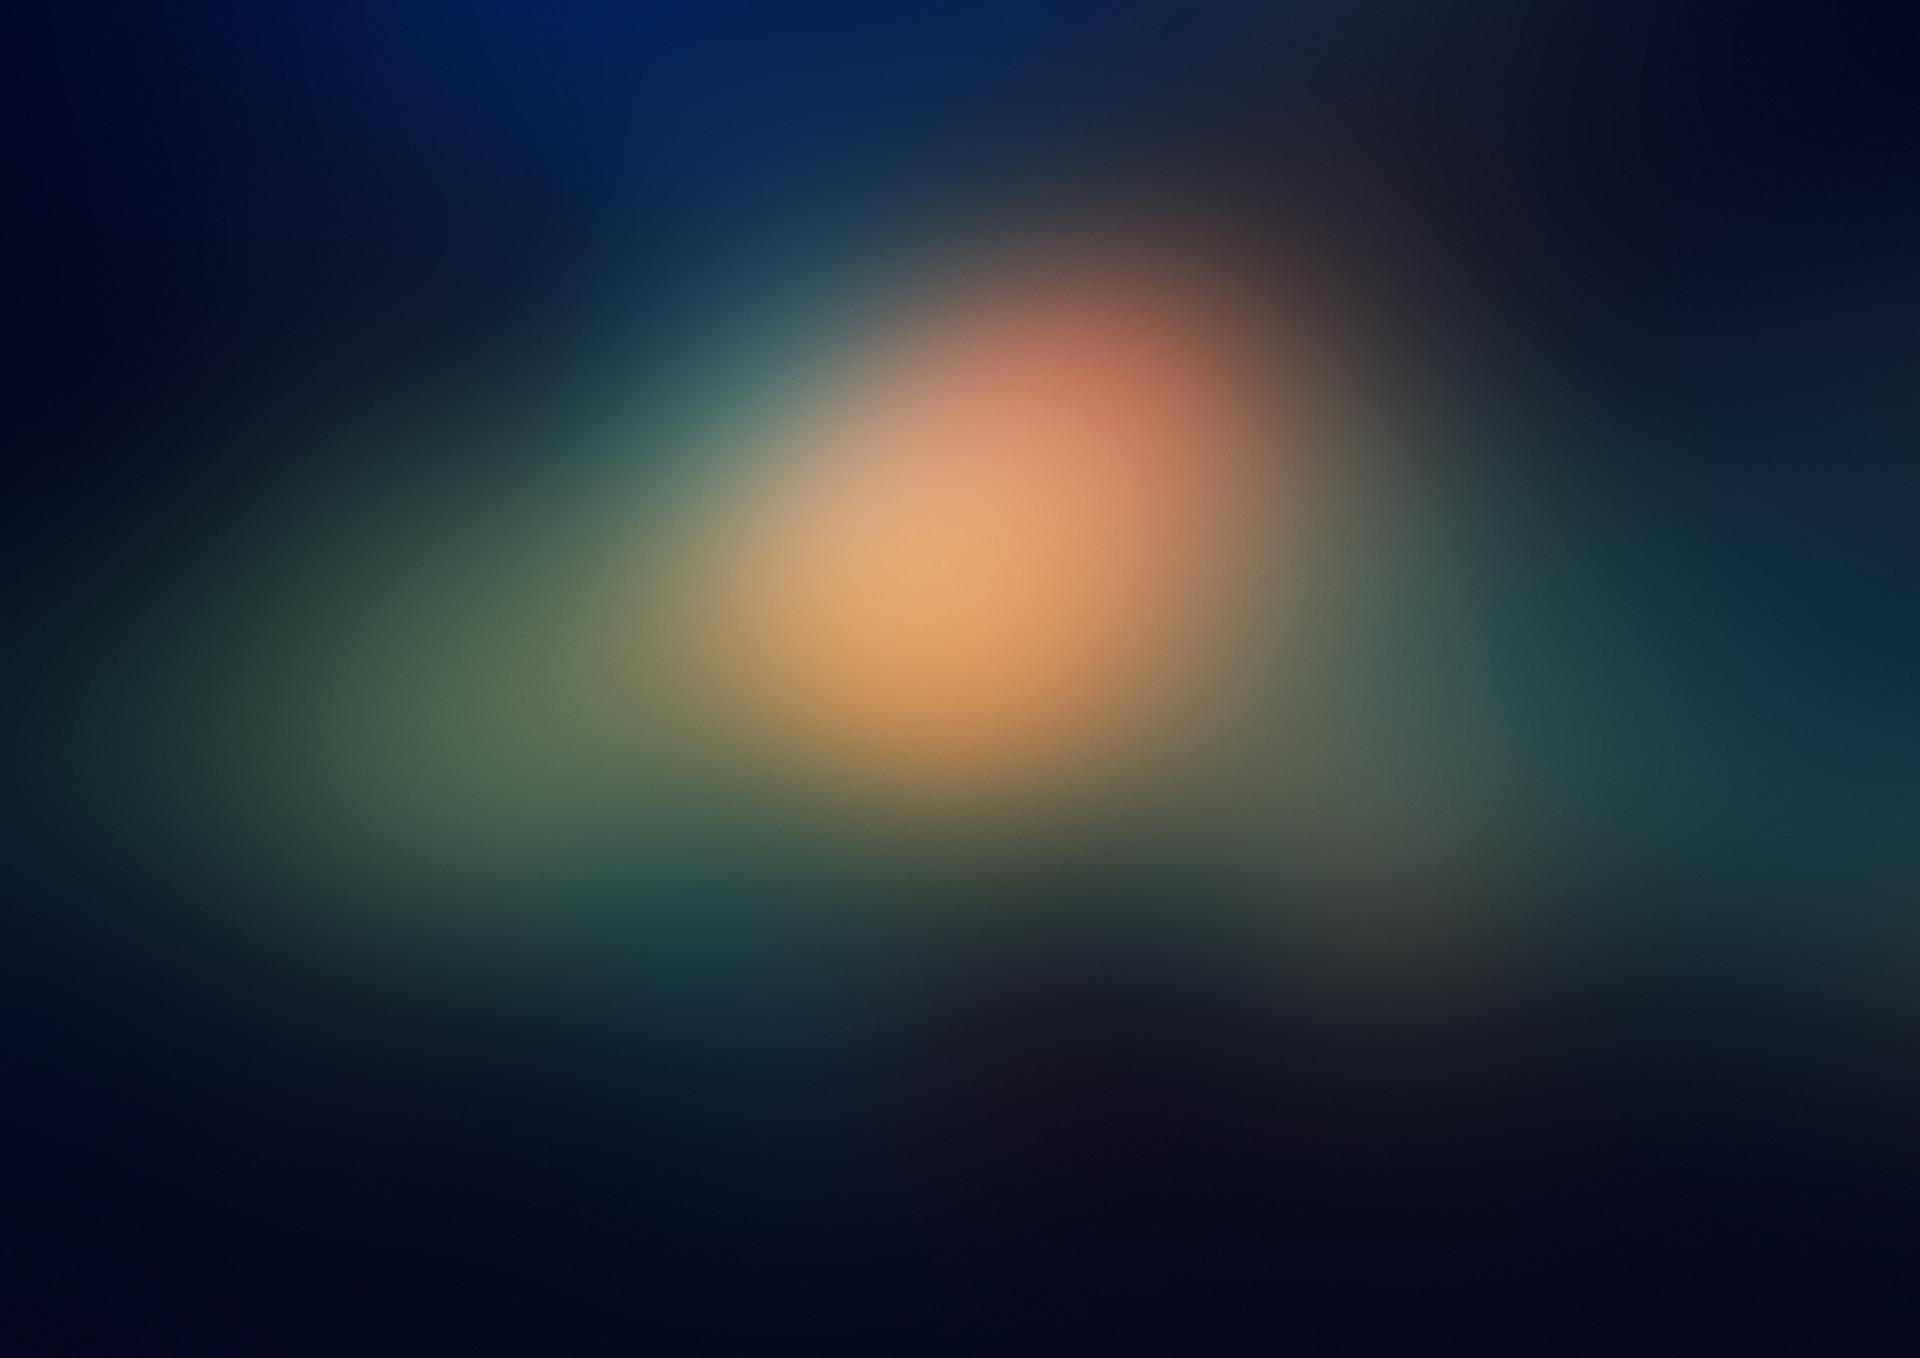 Blurred Vision Hd Desktop High Definition Fullscreen - Parallel , HD Wallpaper & Backgrounds